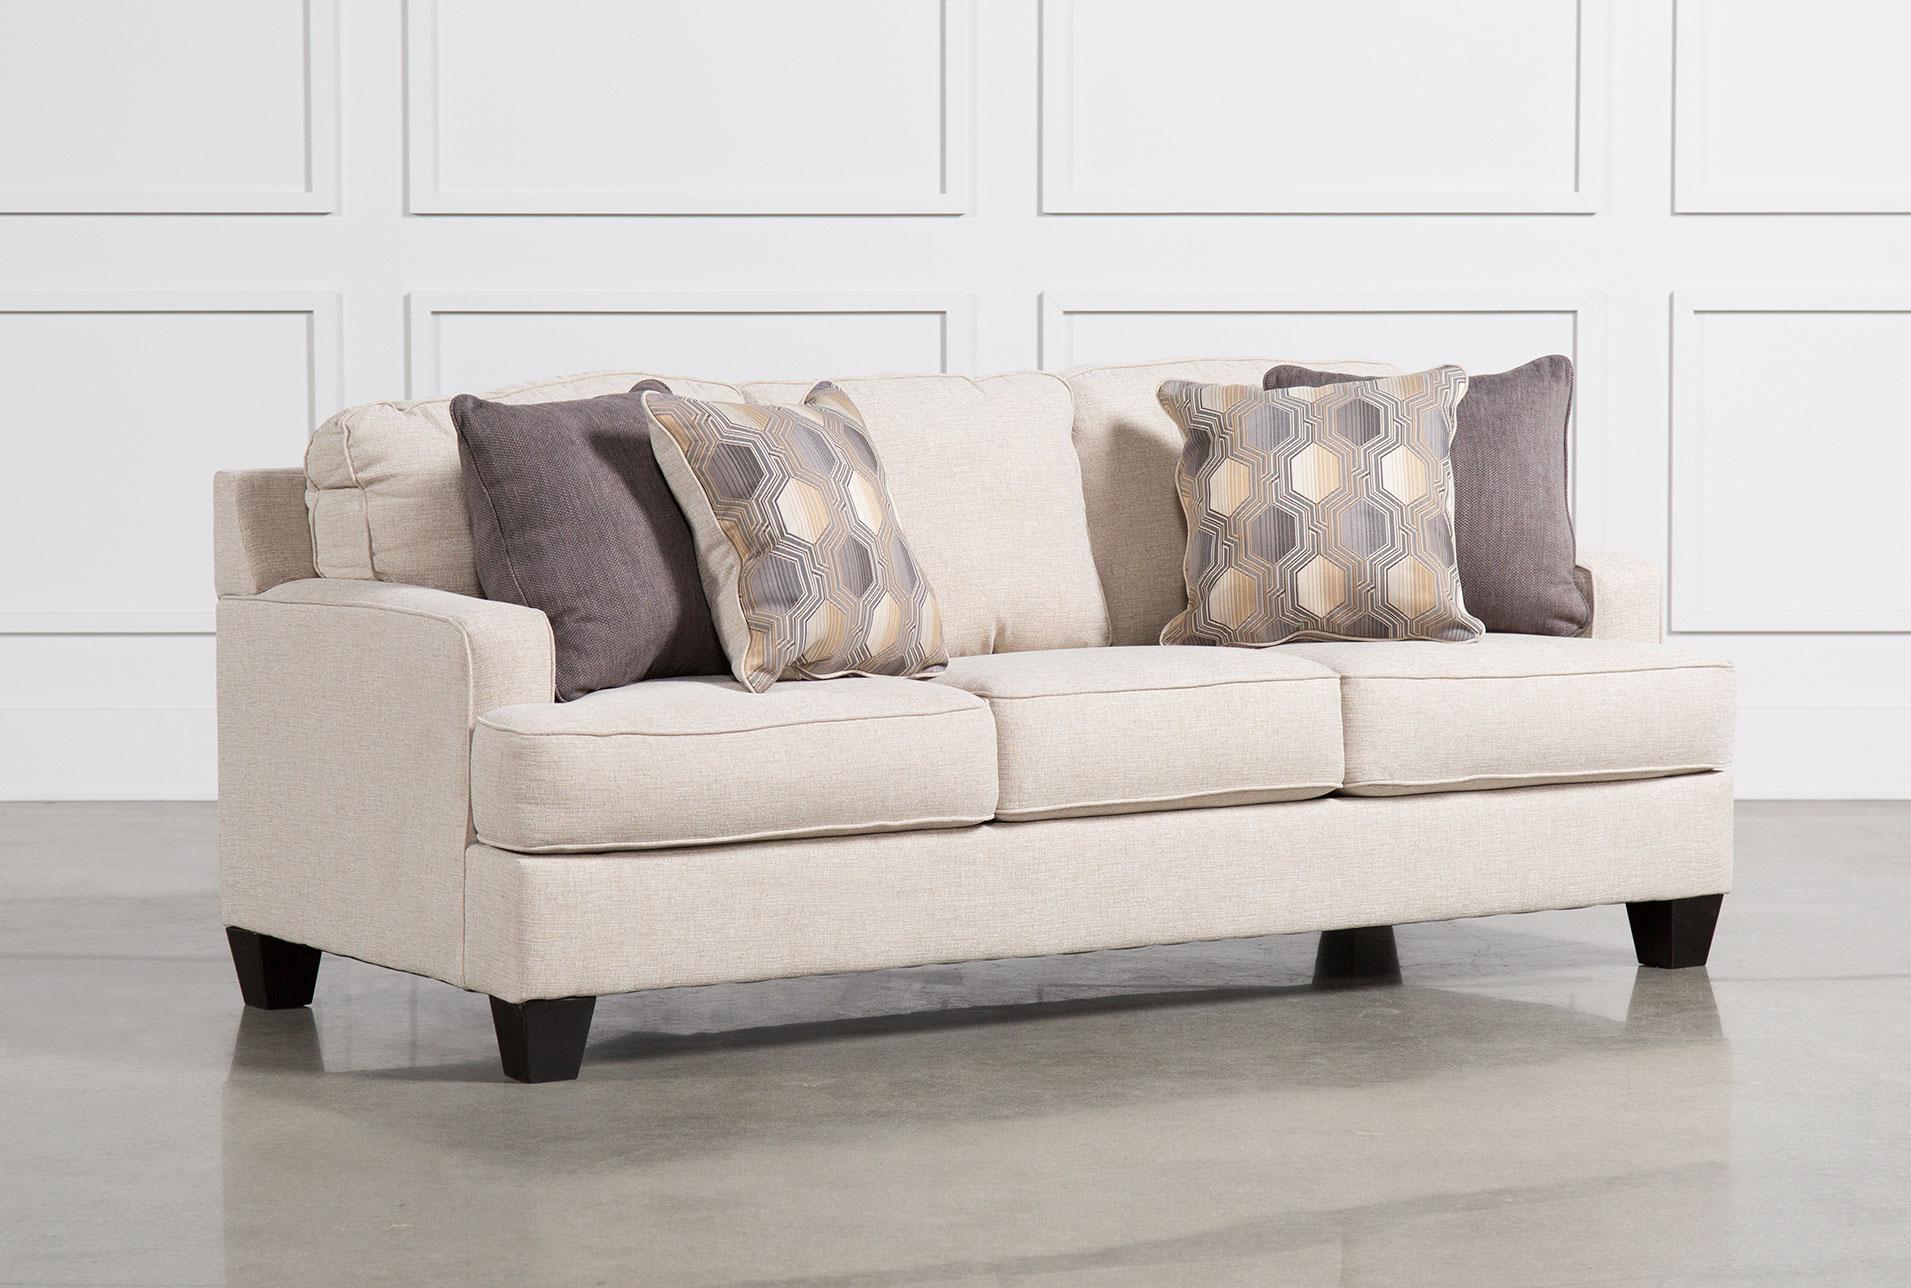 Charmant Brielyn Linen Queen Sofa Sleeper   360